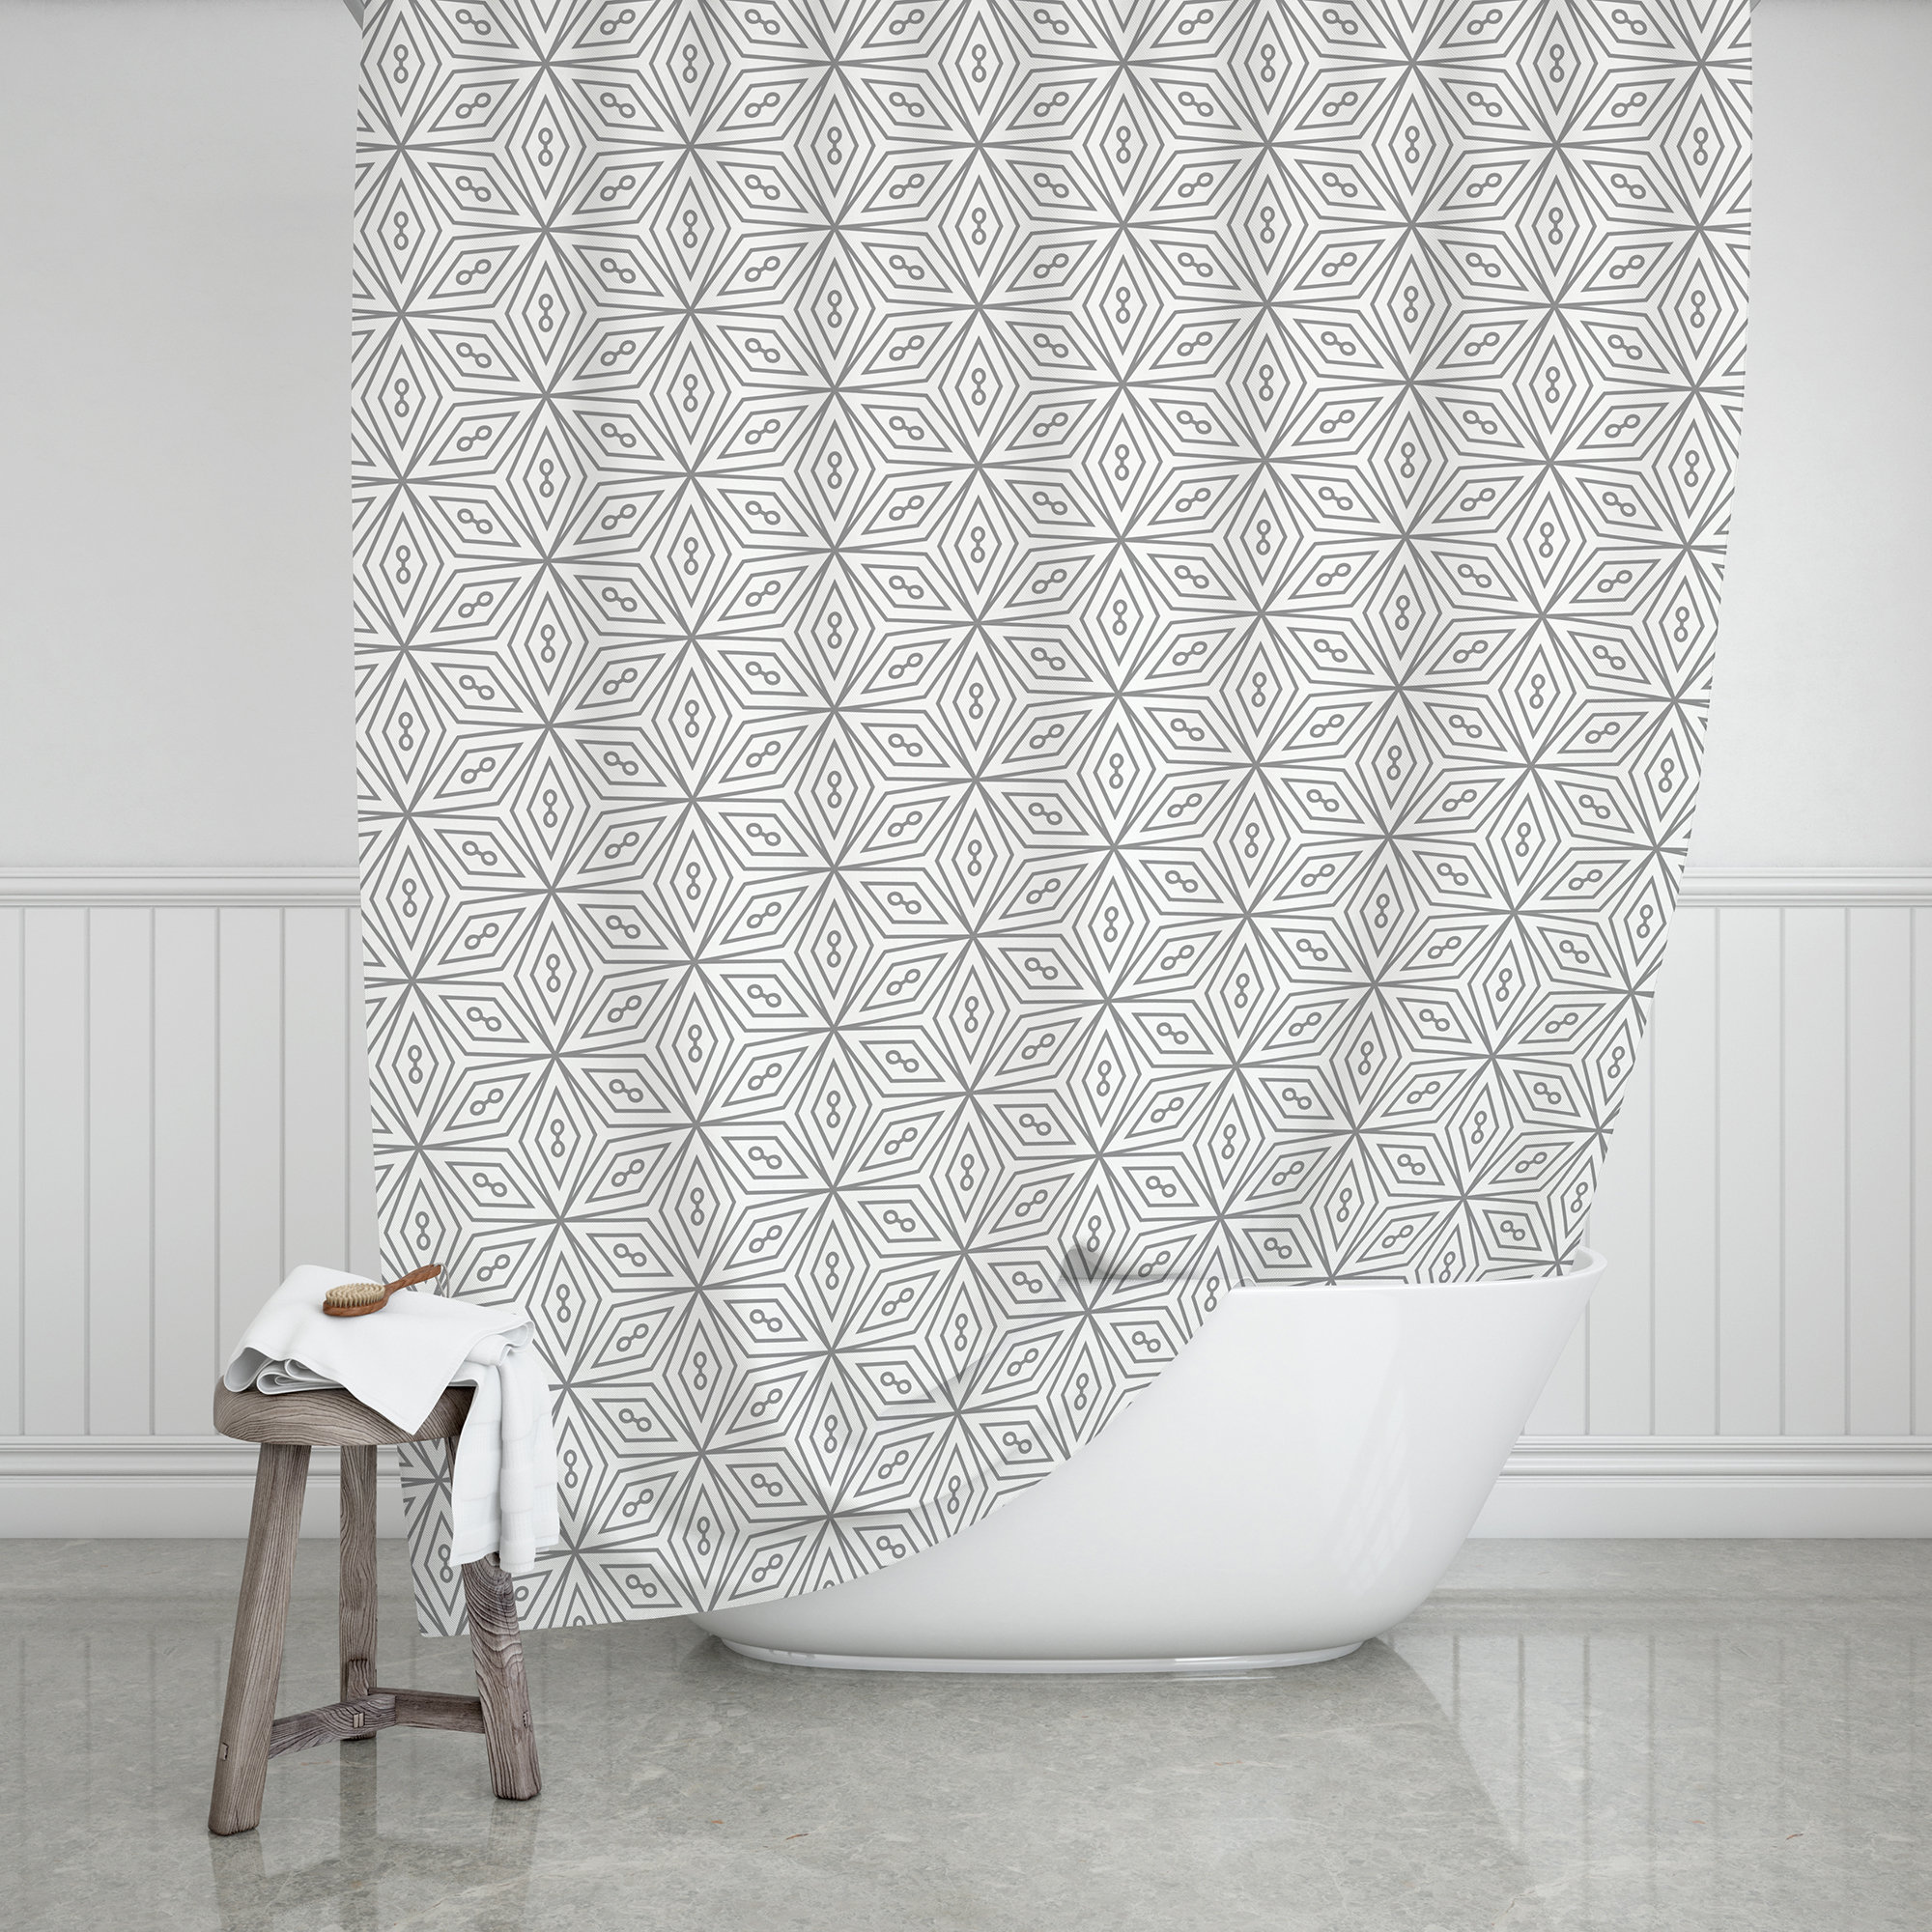 Farmhouse Bathroom Decor Gray And White Shower Curtain